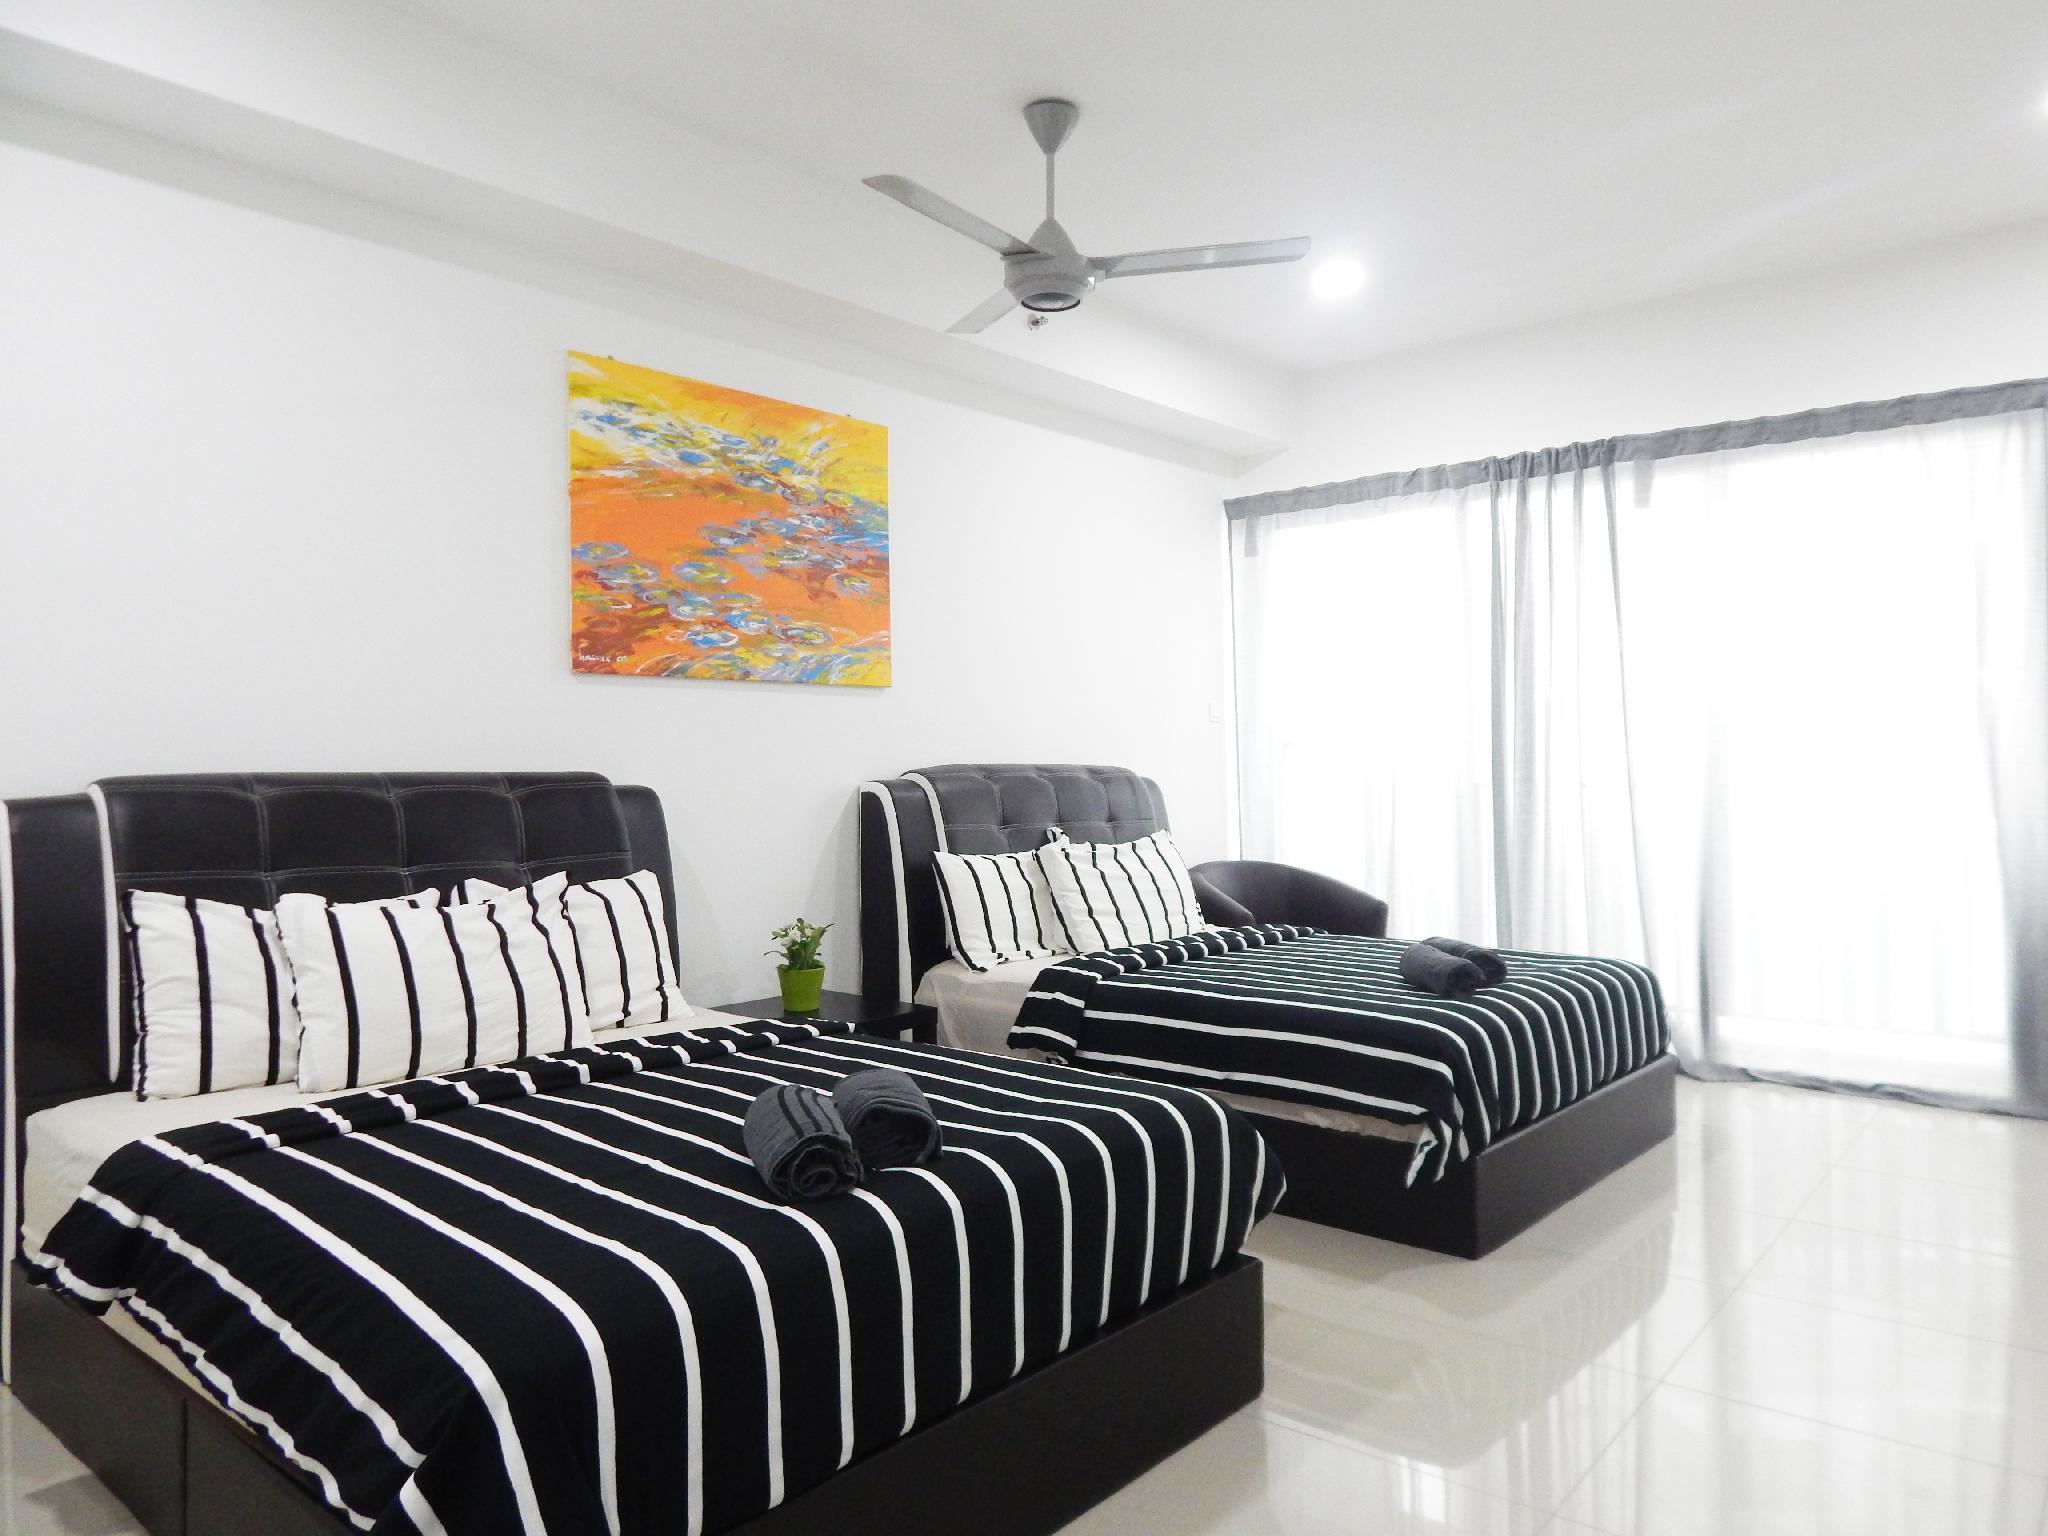 Book Wadi Iman Suites I City In Shah Alam Malaysia 2019